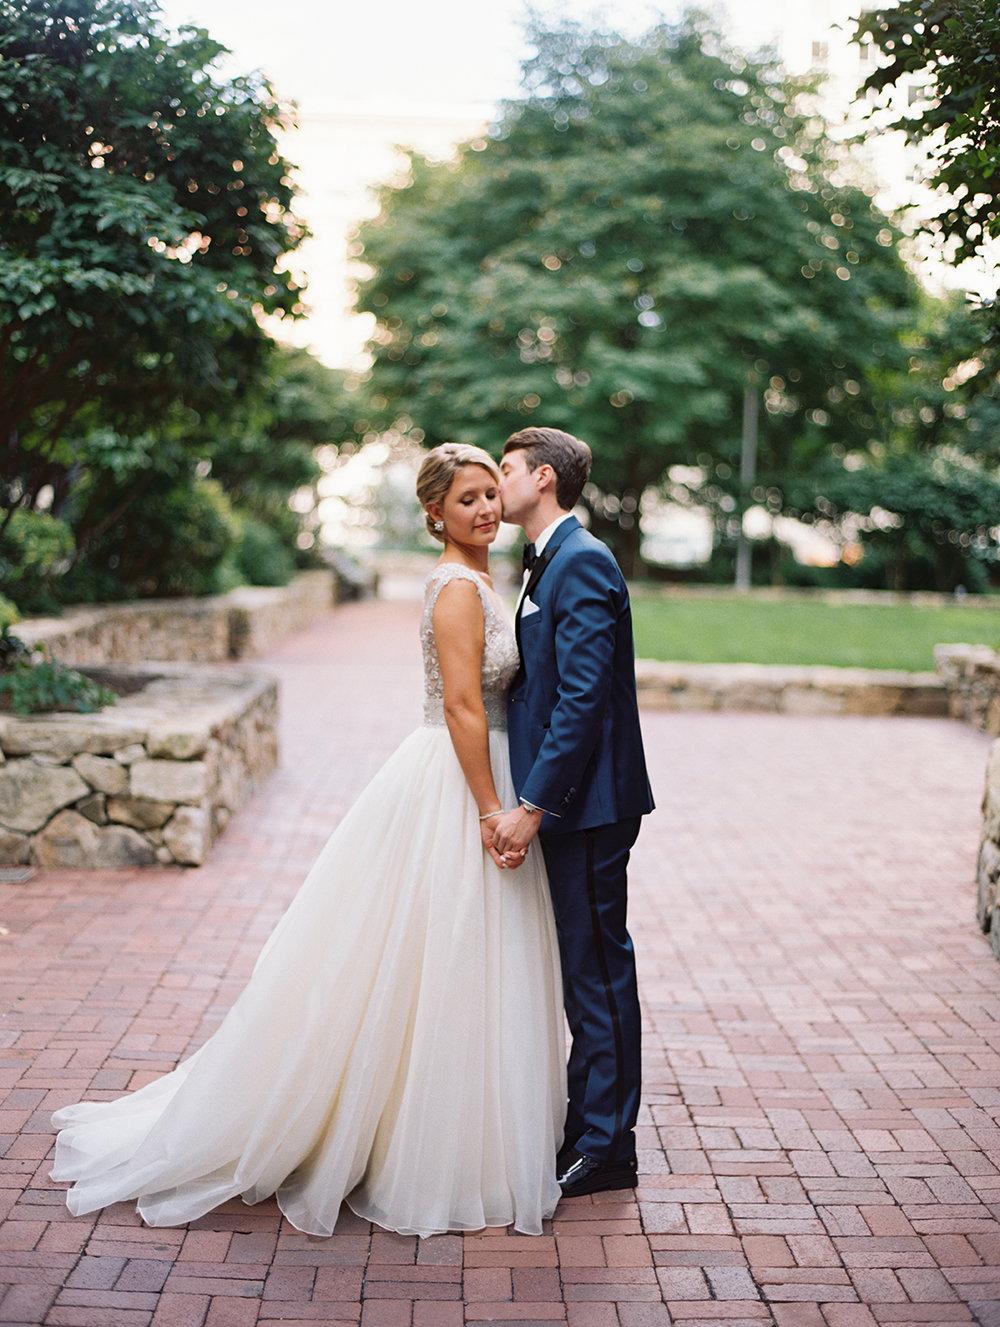 166-andrew-megan-boston-public-library-wedding-film-photographer.jpg